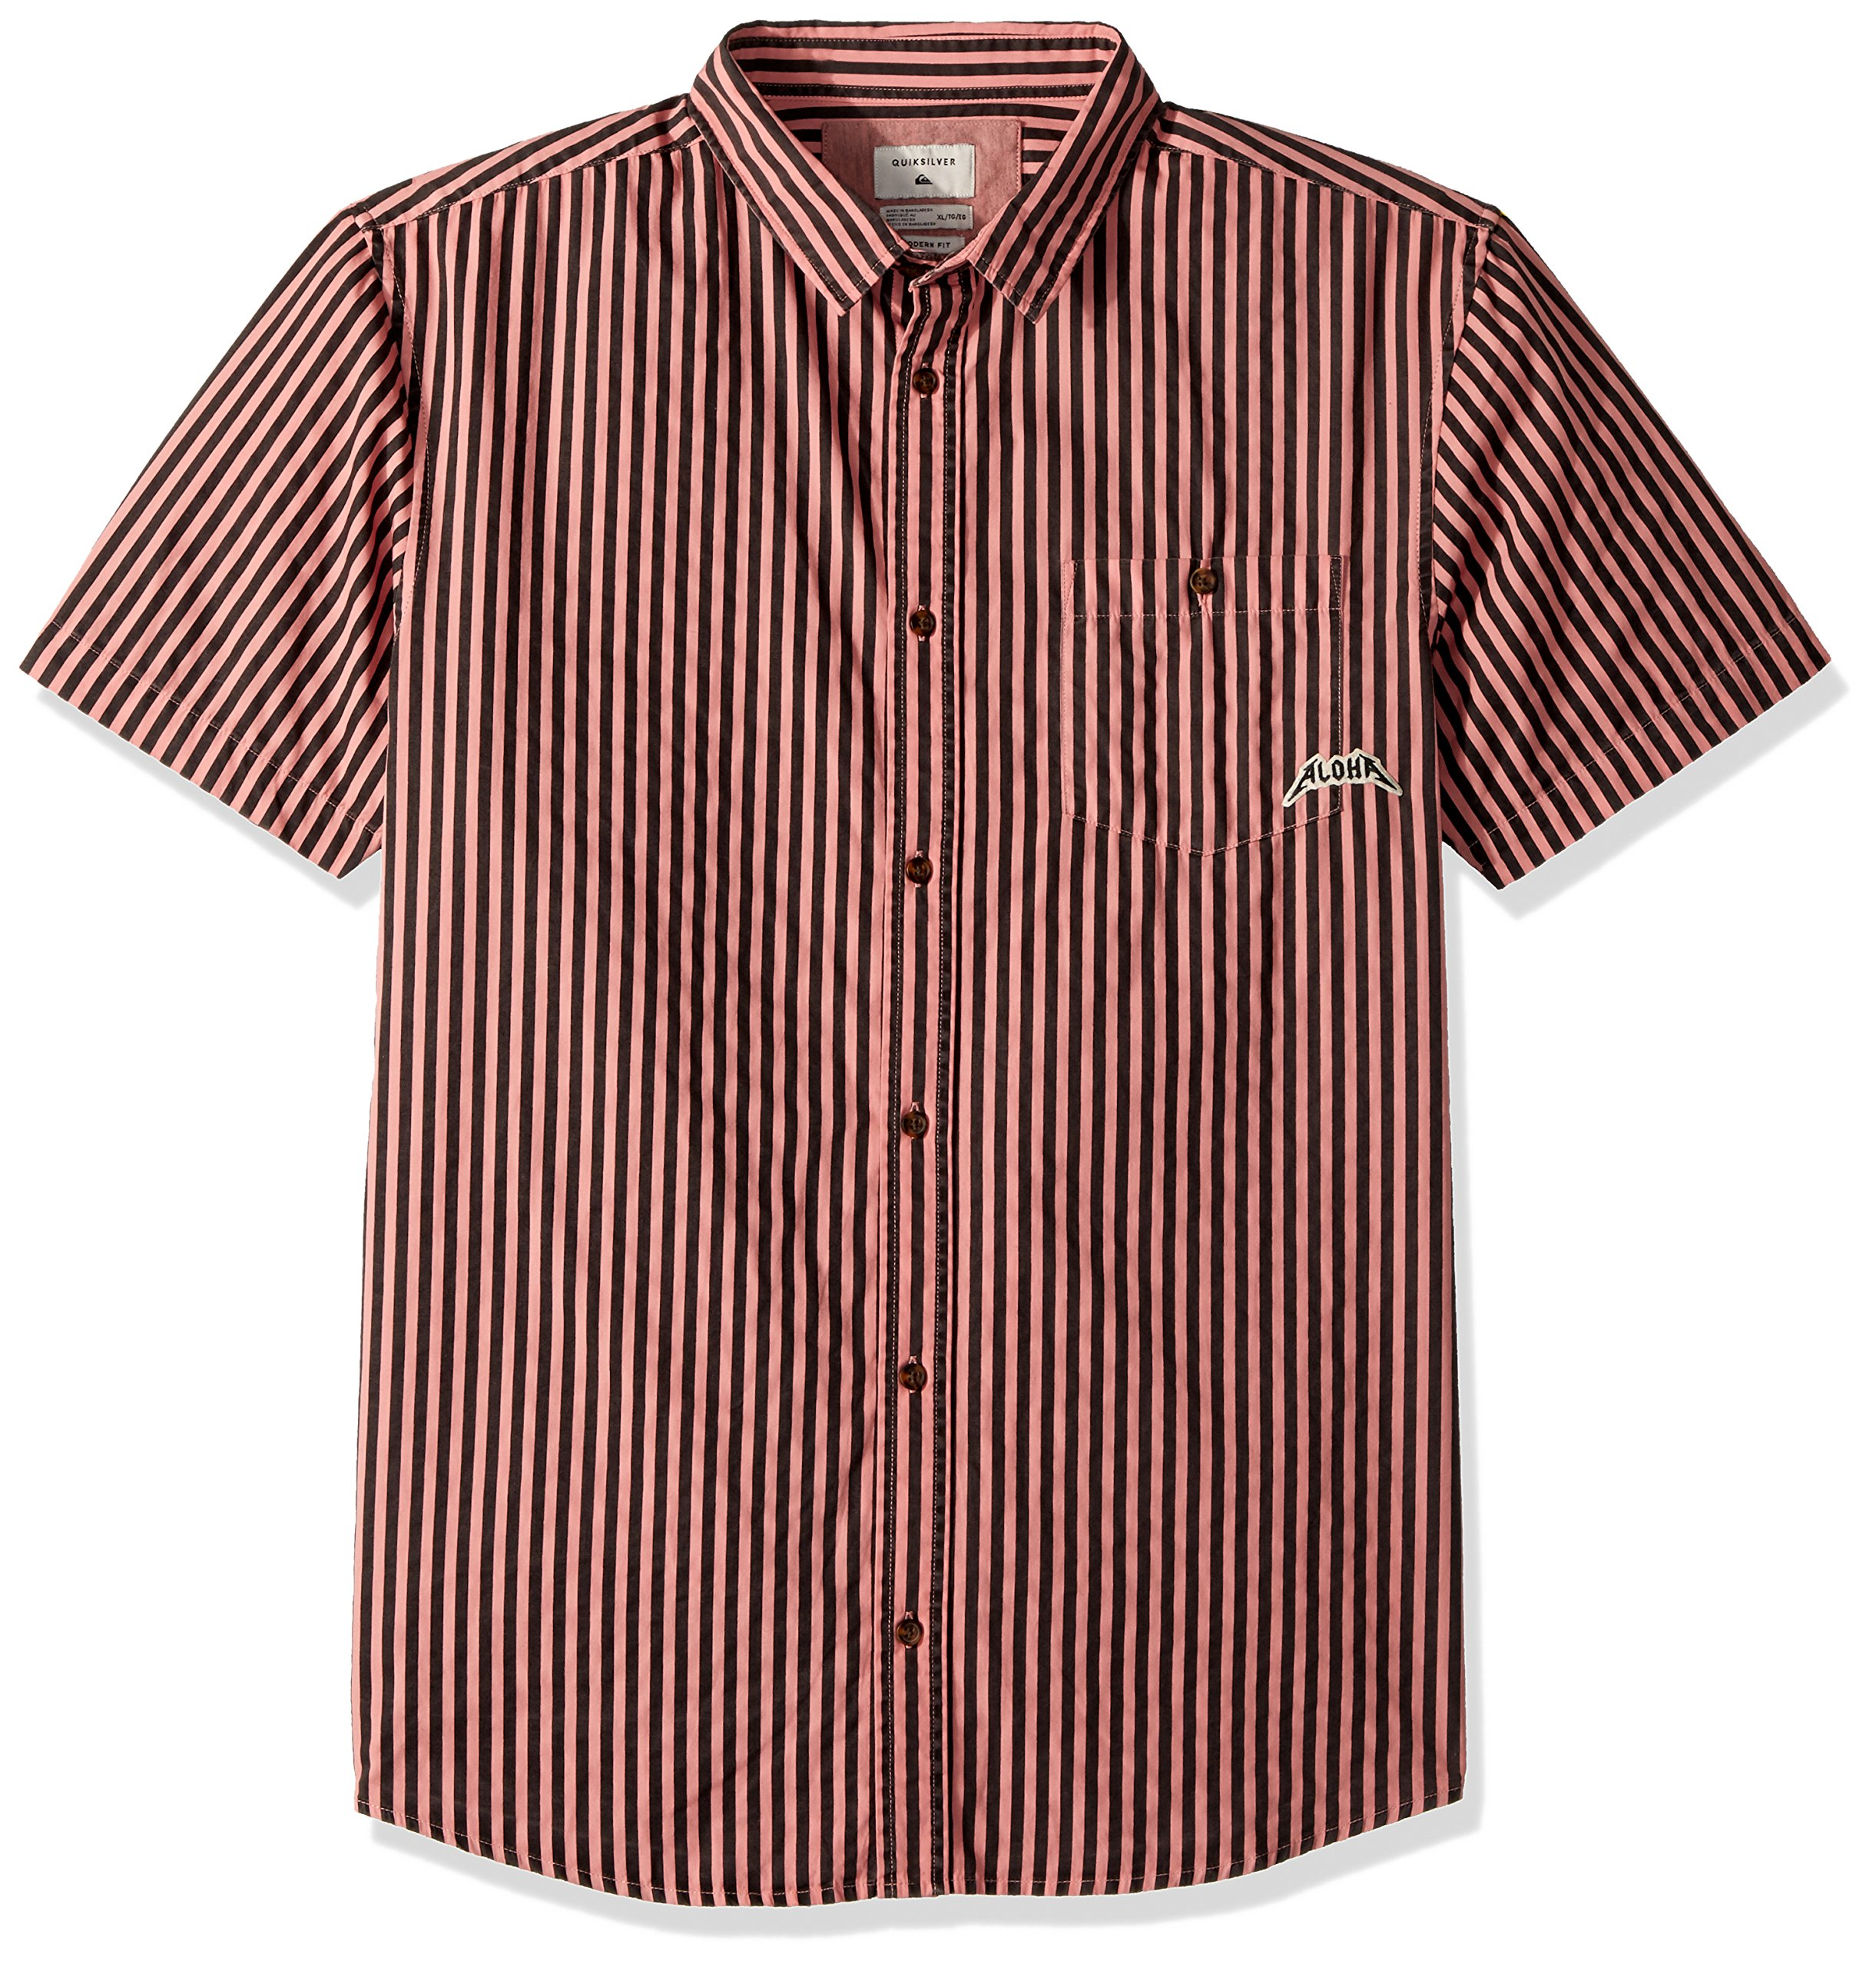 Quiksilver Men's Bro Stripe, Mineral Red Goofy Bro, M